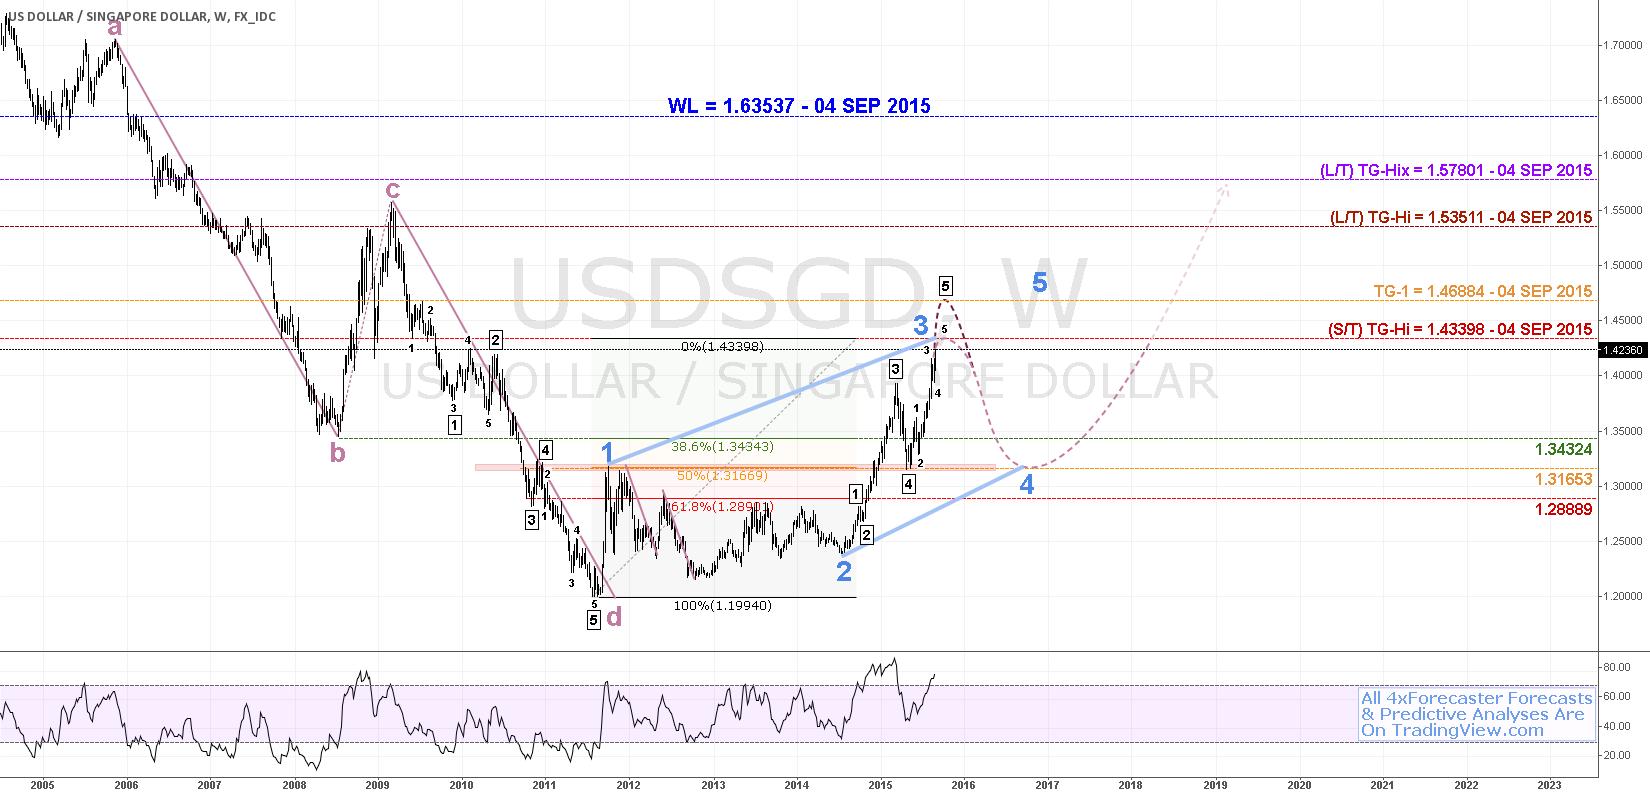 $USD v $SGD: S/T Bearish; L/T Bullish; 50% Support At #fibonacci